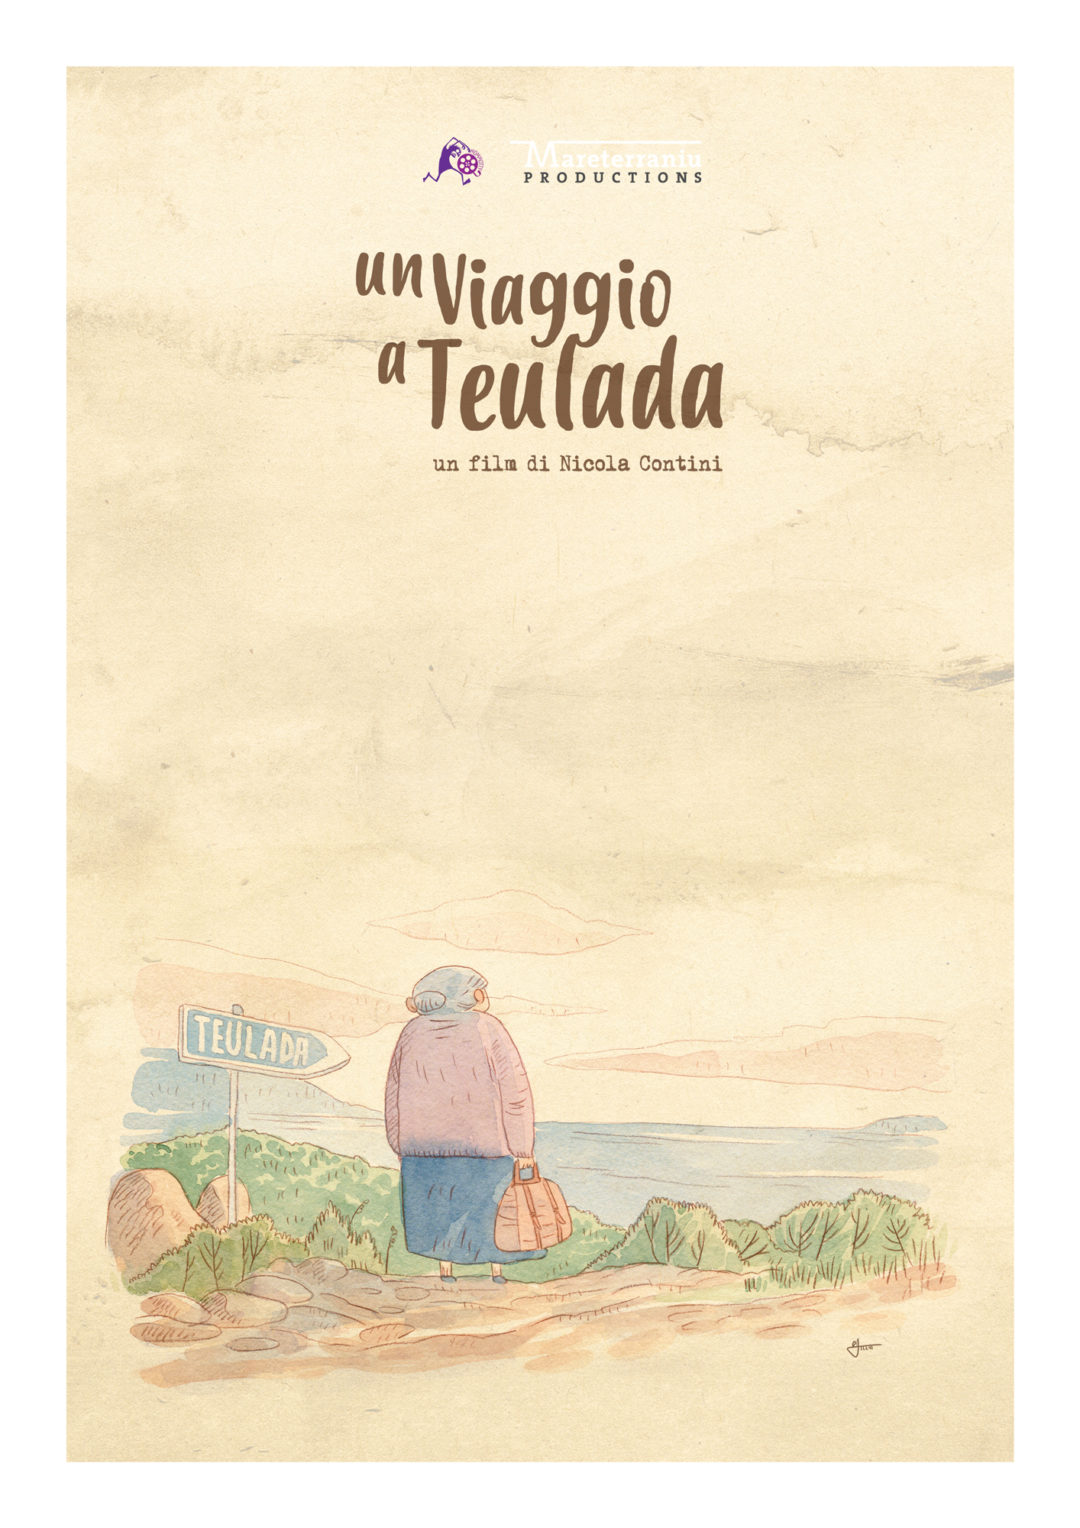 TRIP TO TEULADA